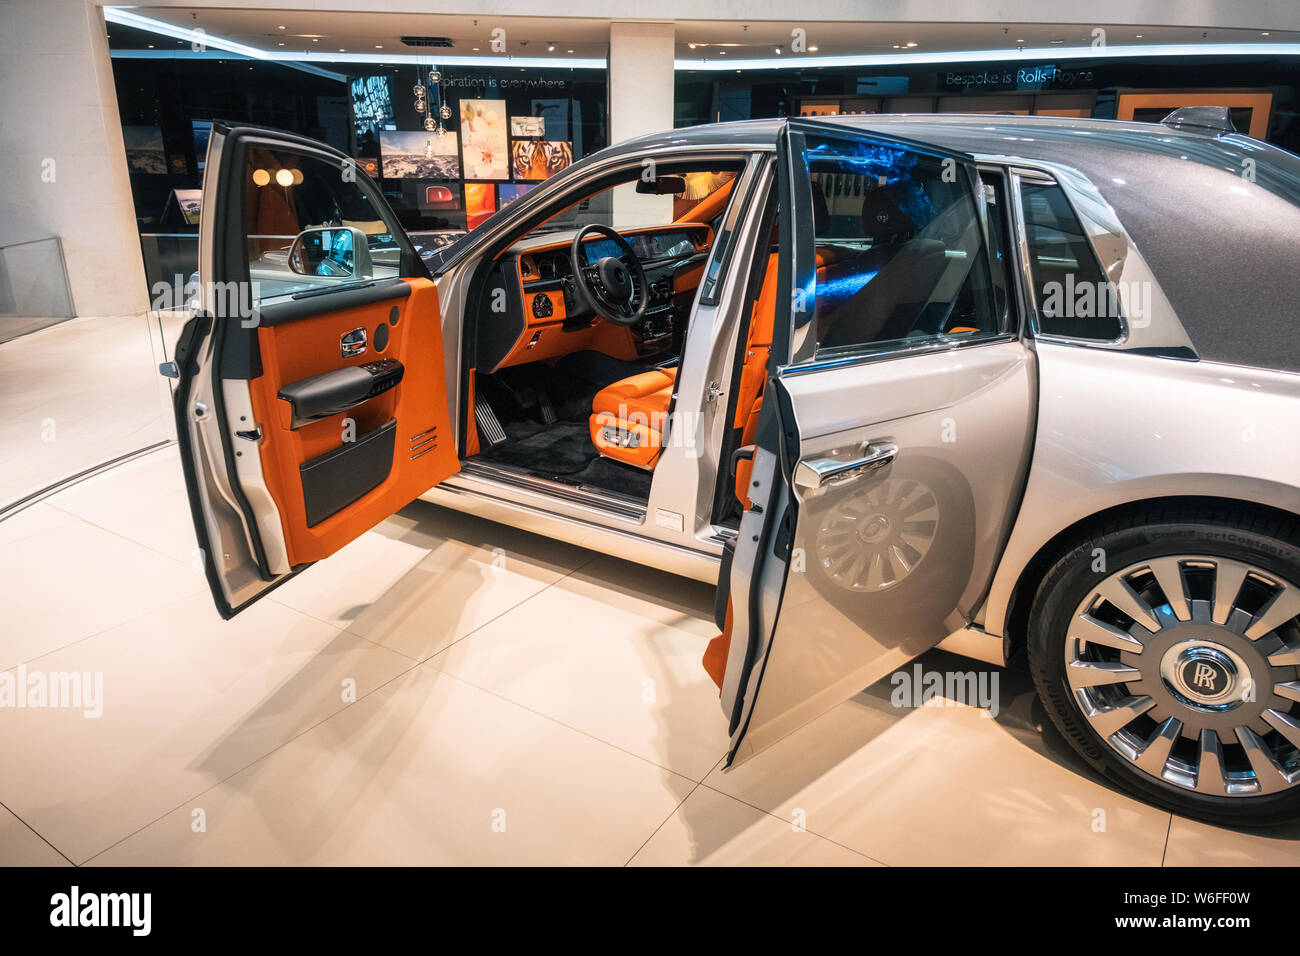 Munich Germany December 7 2017 Interior View Of Luxury Rolls Royce Phantom Viii 8 Car With Opened Doors Dashboard And Steering Wheel Stock Photo Alamy